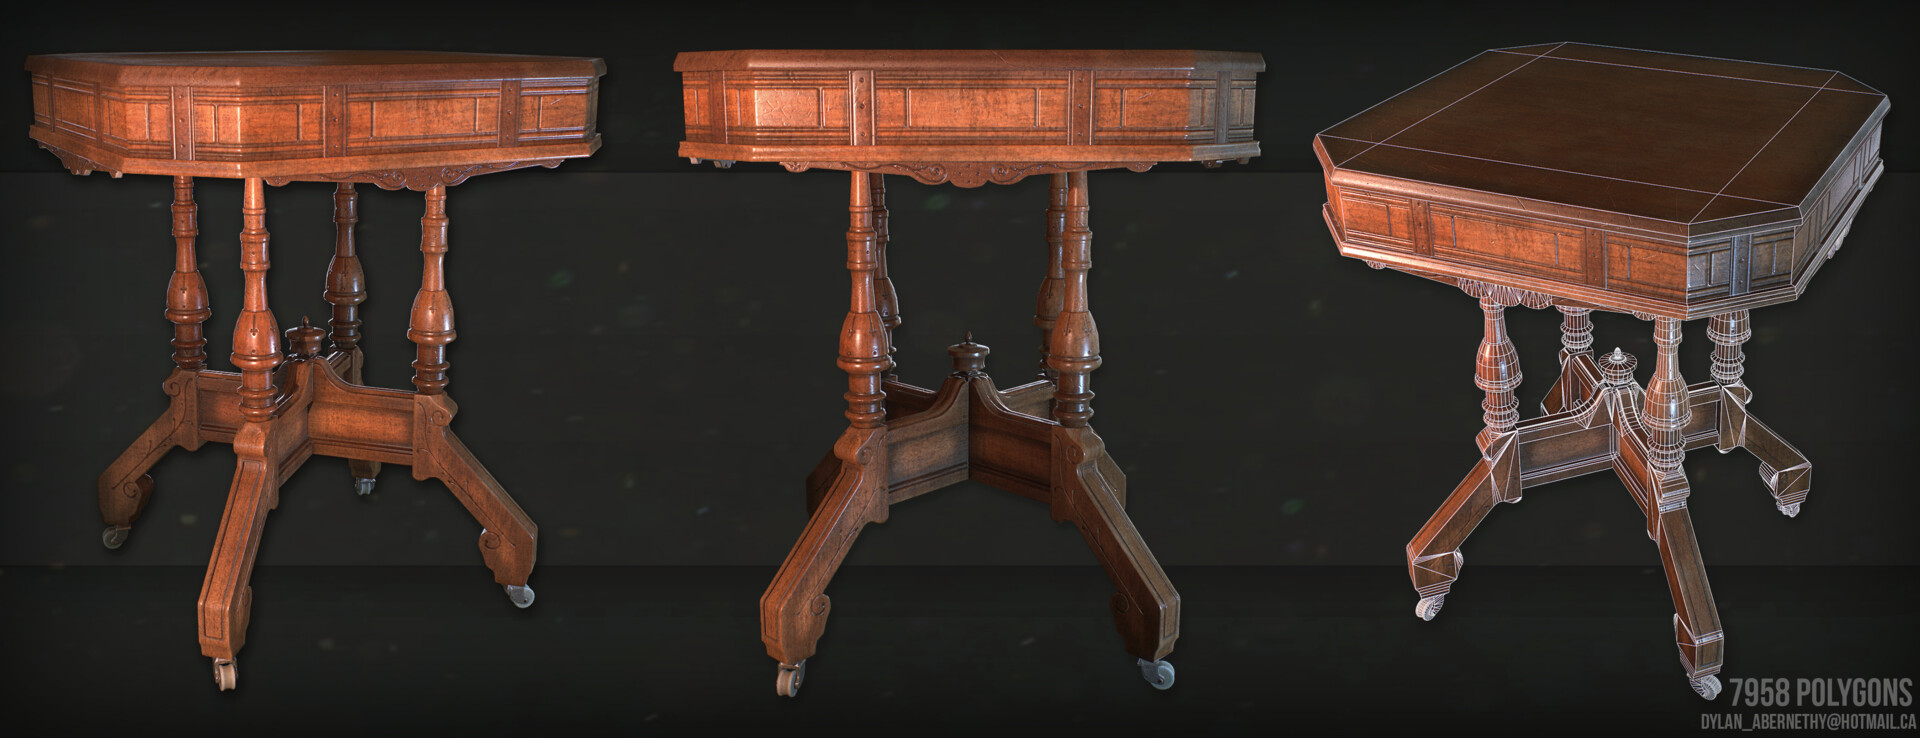 Table Breakdown